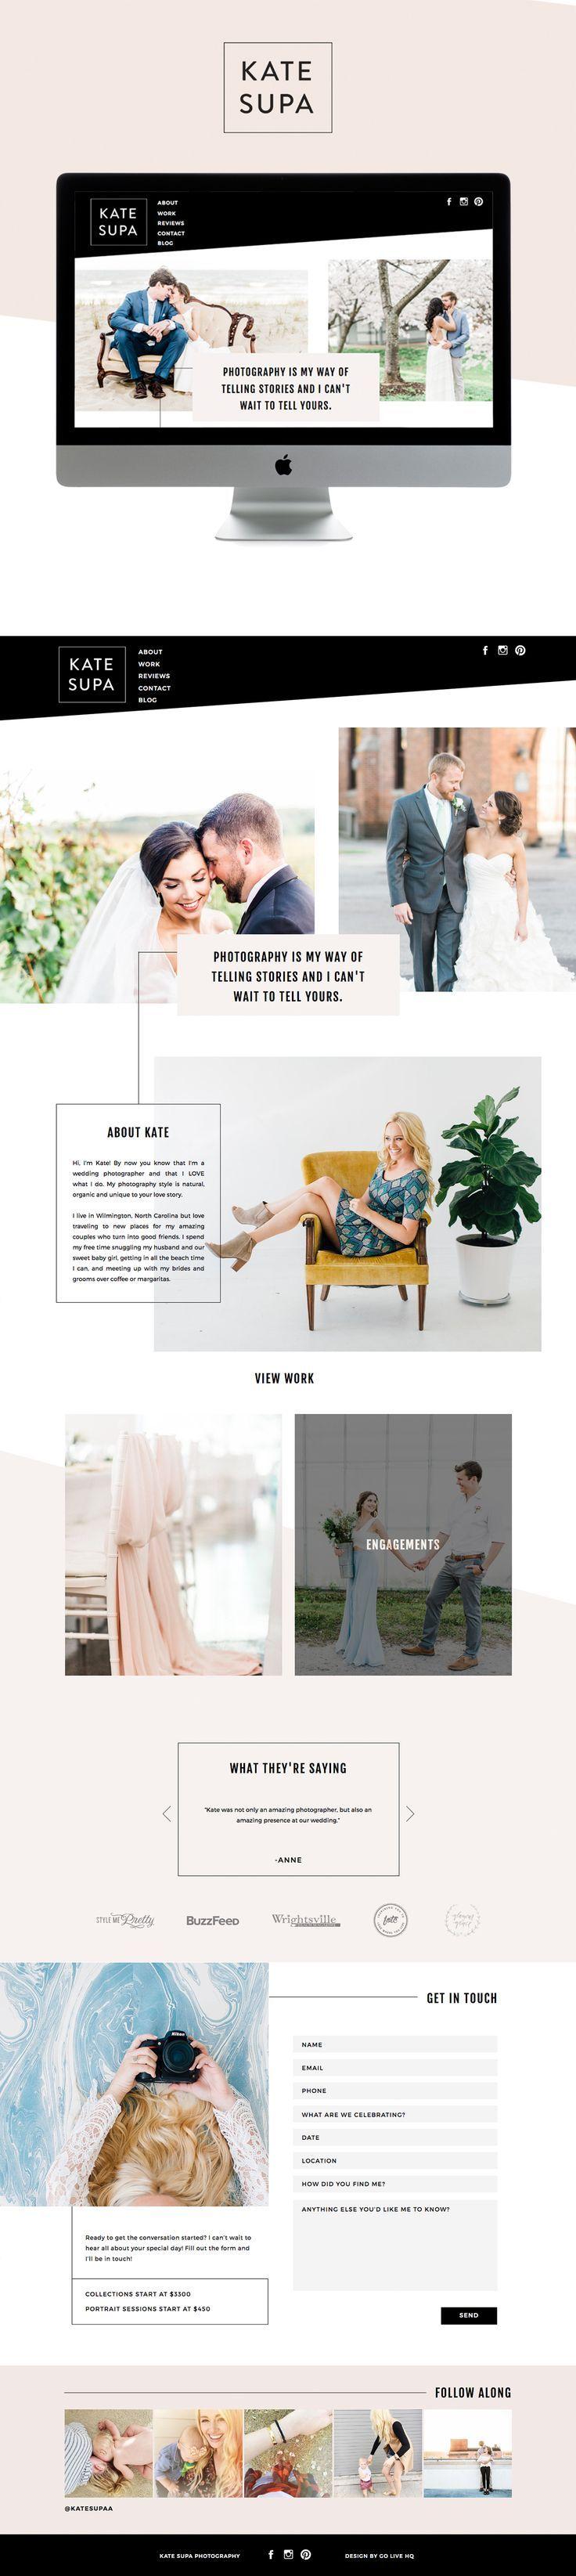 clean, minimal yet bold showit website design | designed by: http://golivehq.co